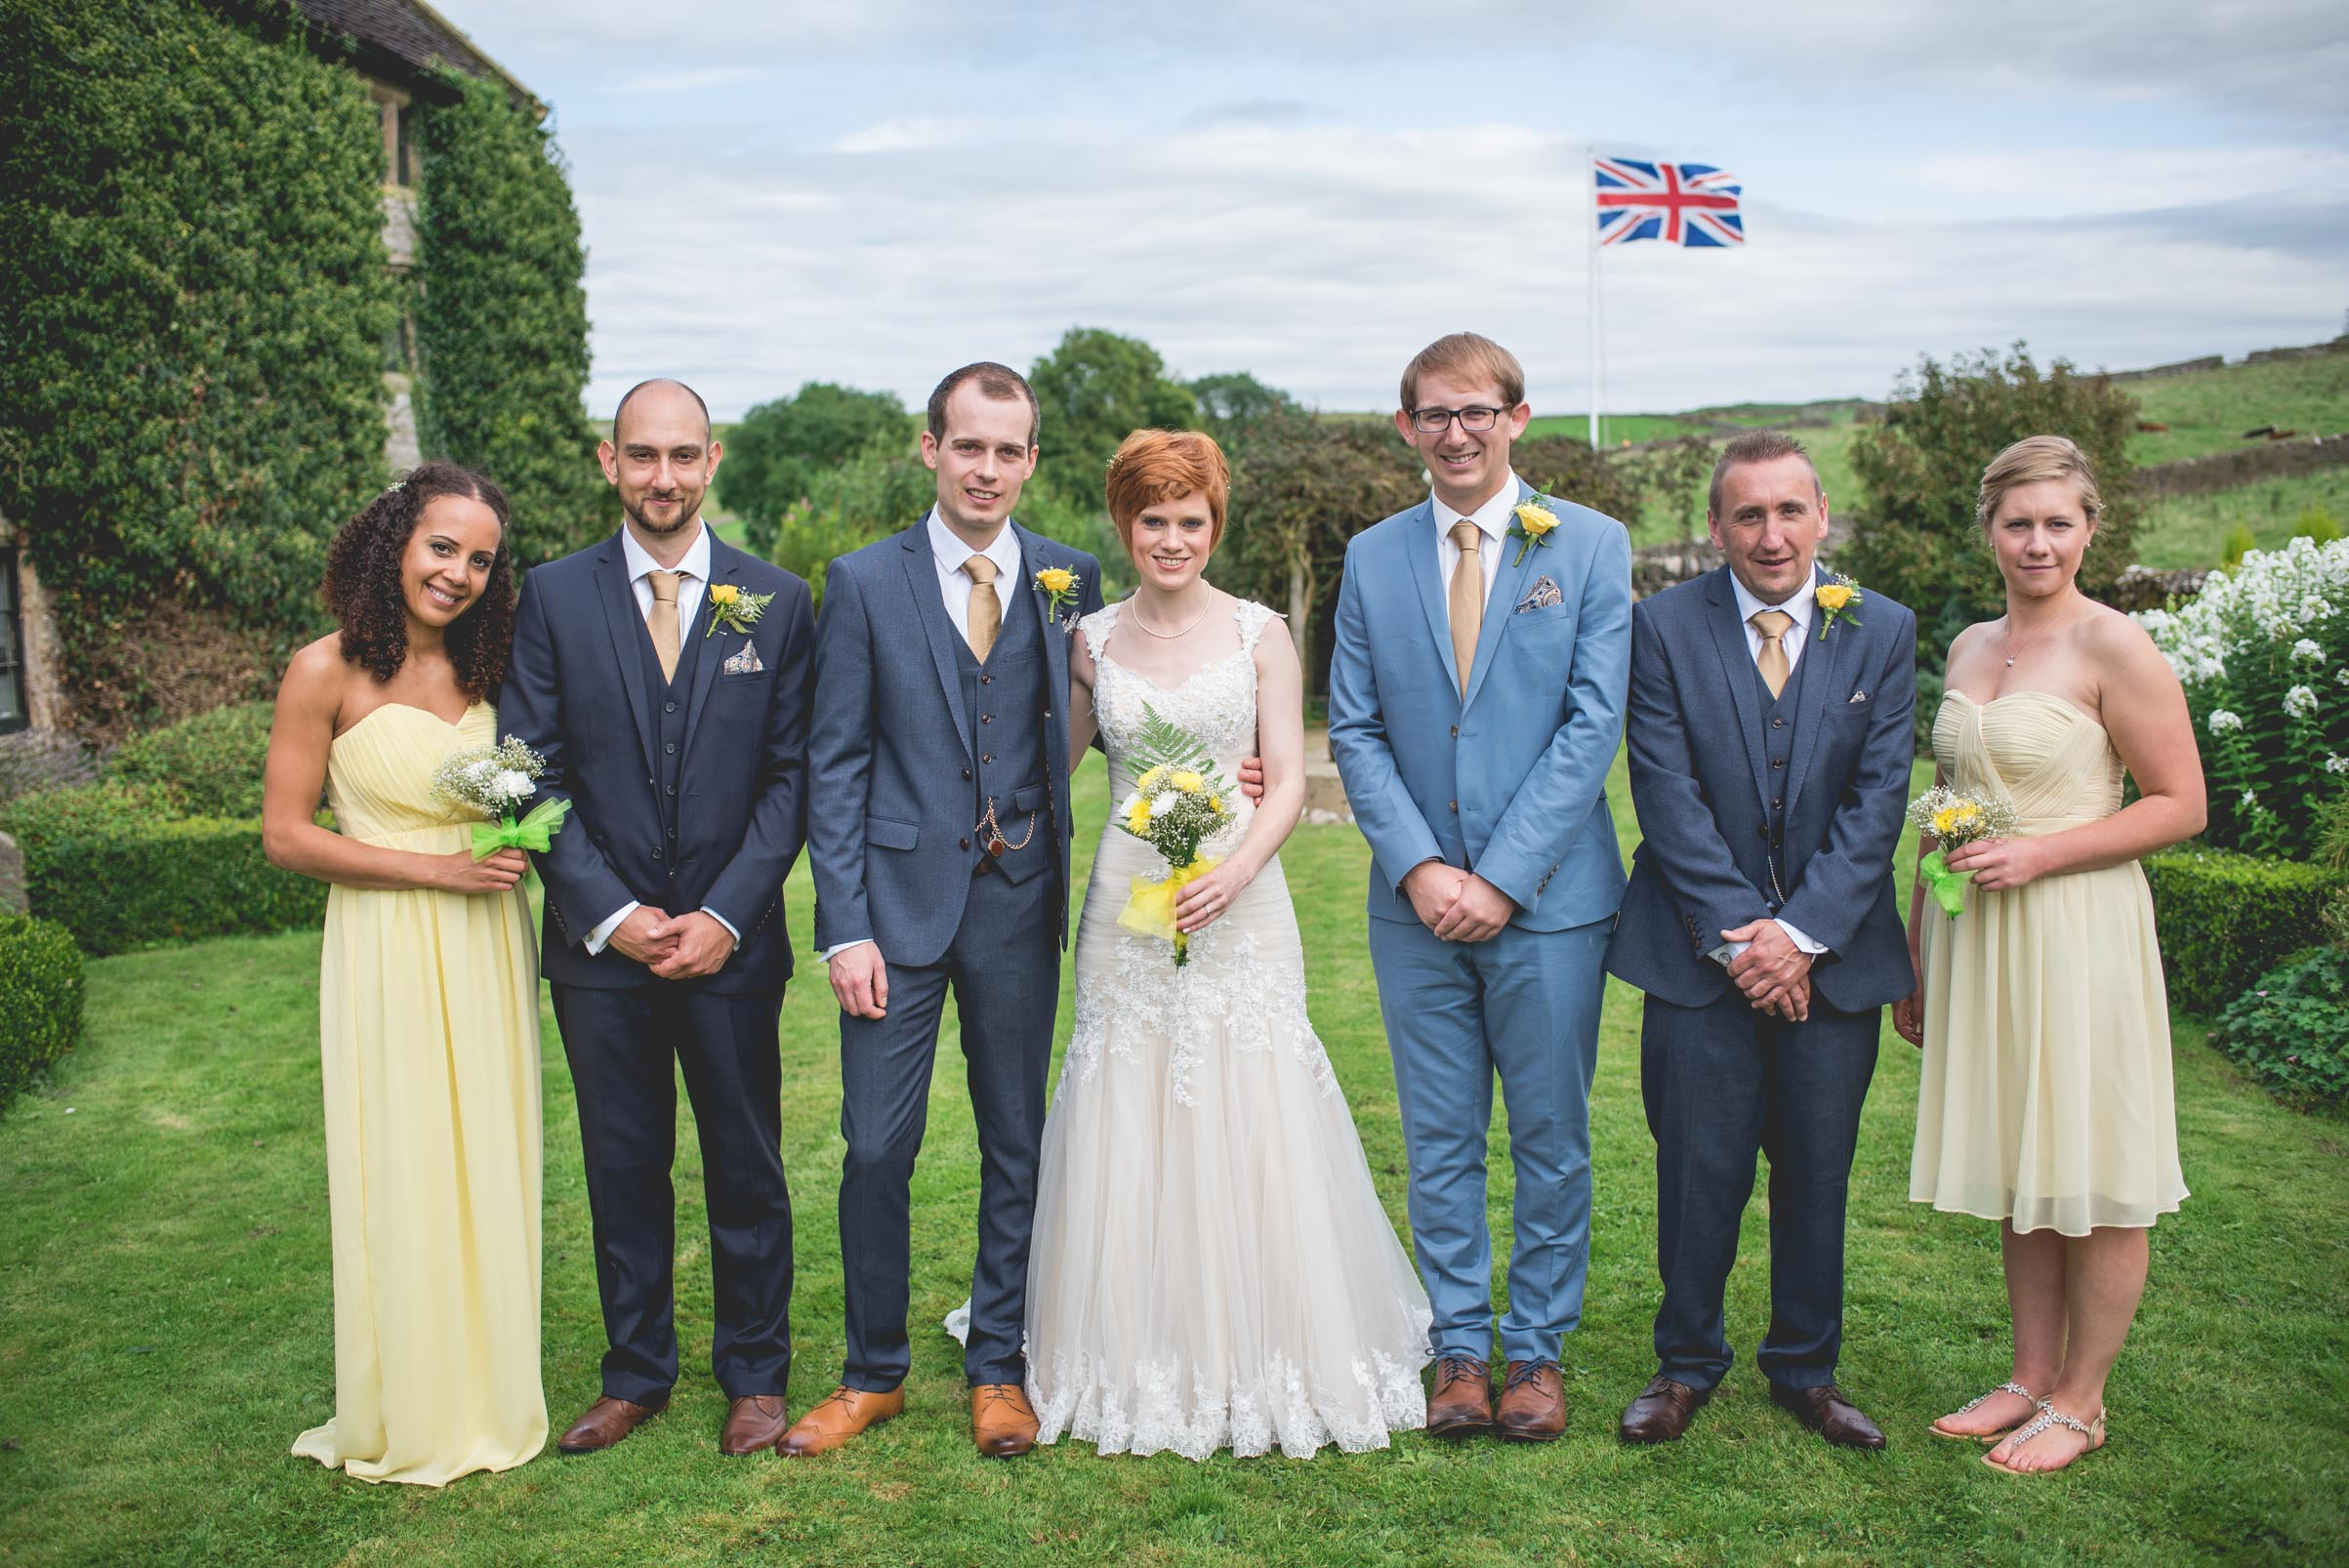 Peak+district+farm+wedding+lower+damgate+photographer-82.jpg